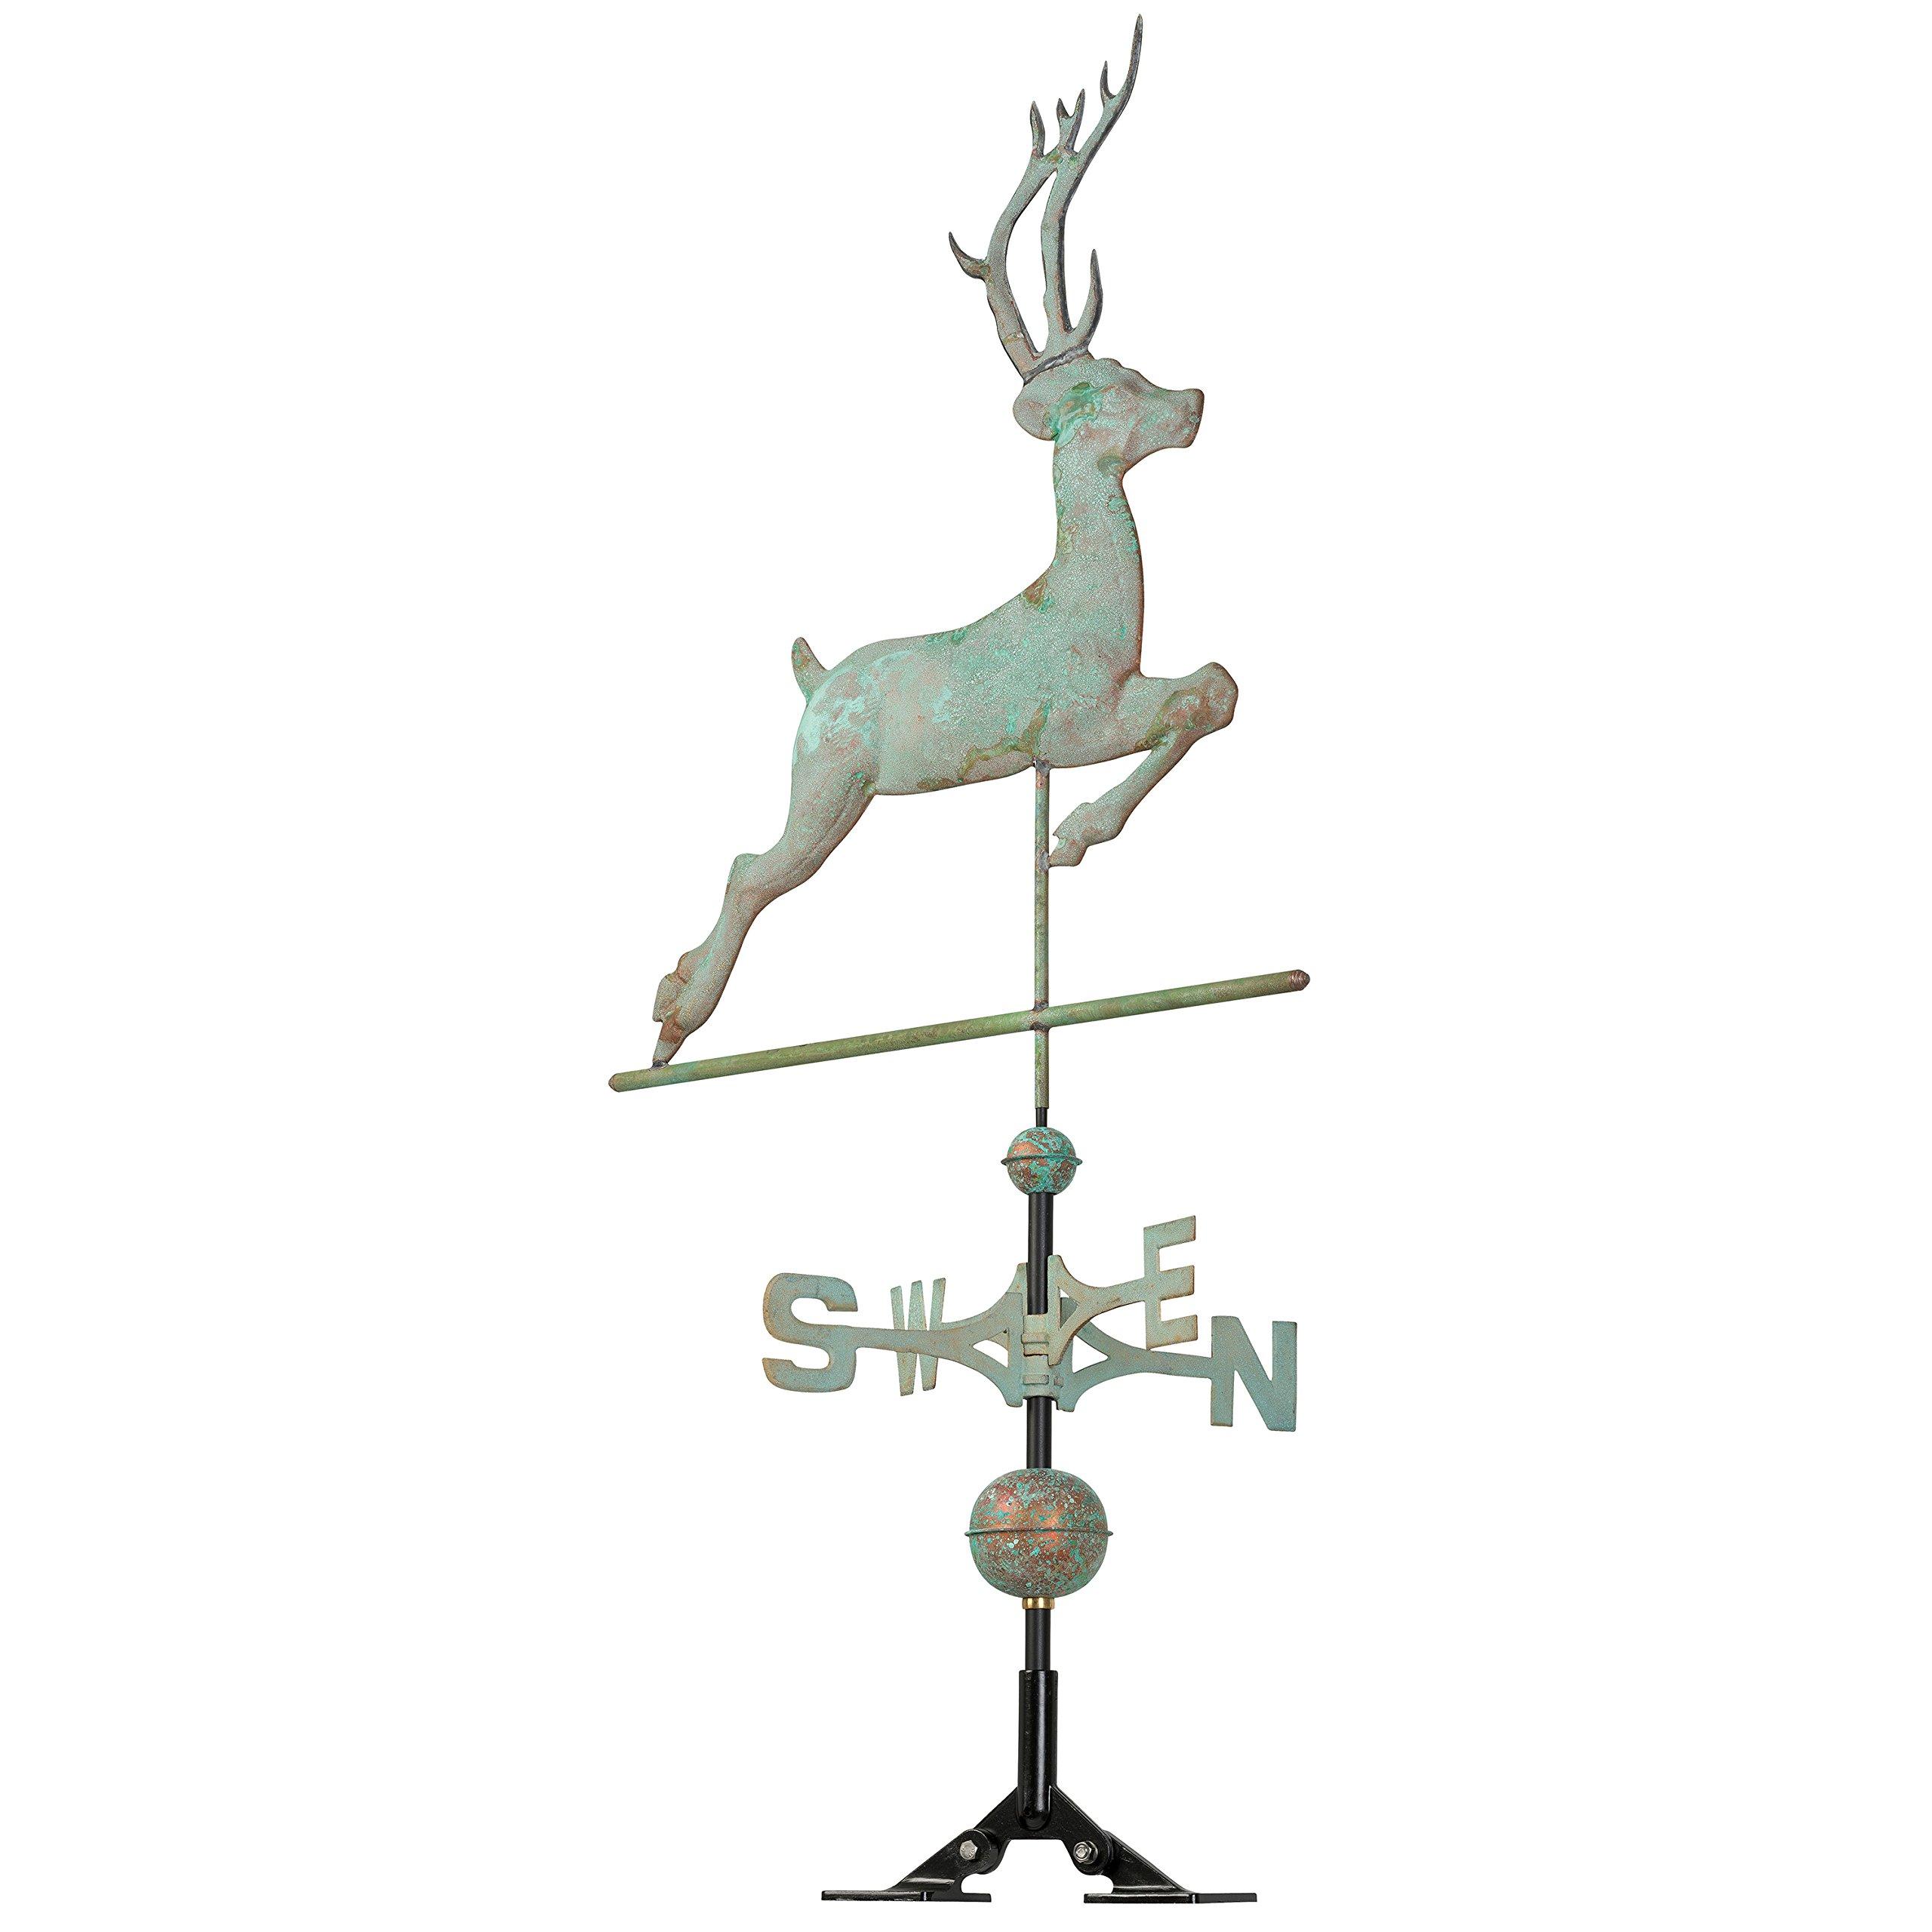 Whitehall Products Copper Deer Weathervane, Verdigris